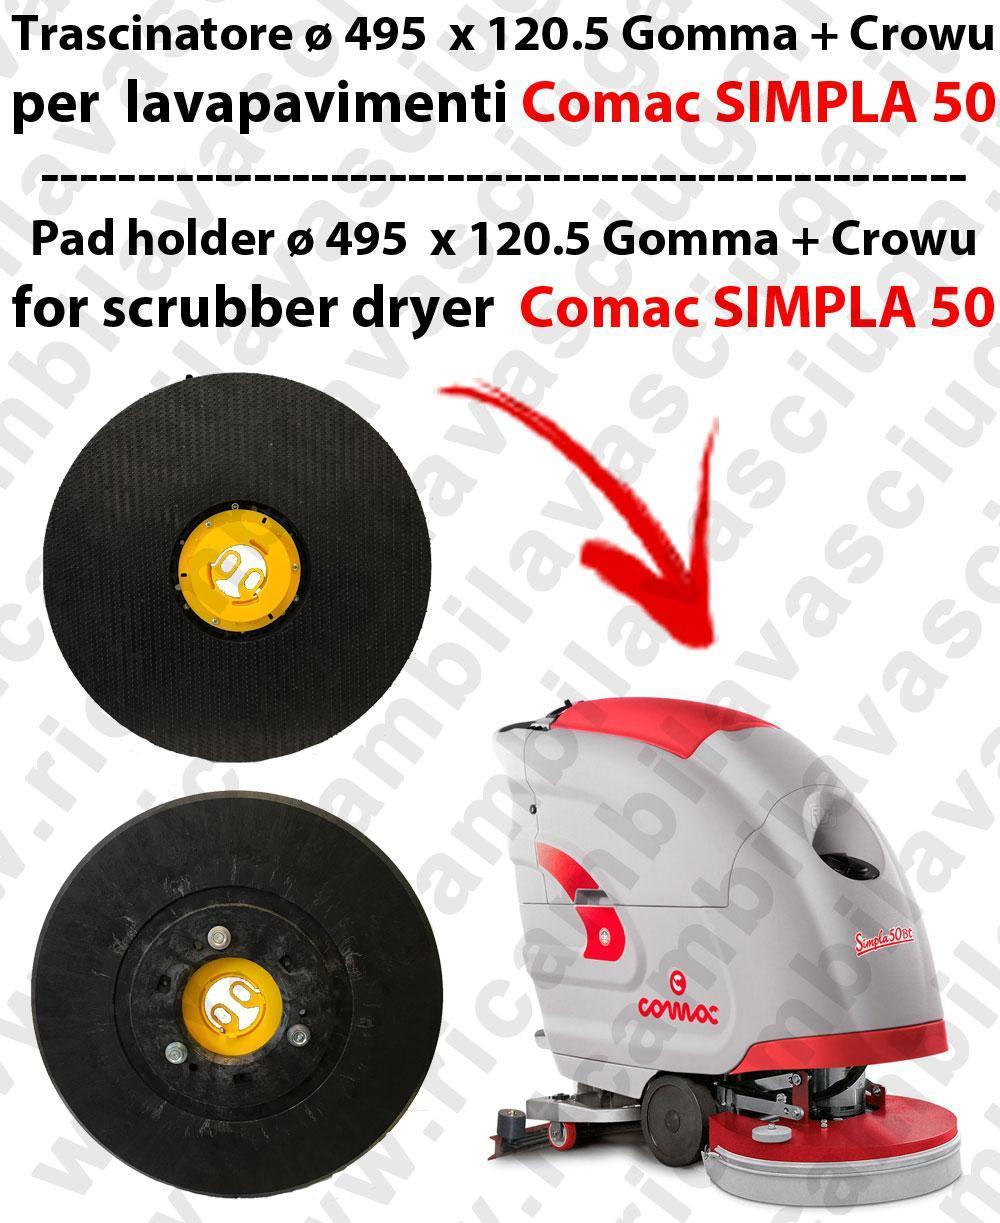 Padholder ( pad holder) for scrubber dryer COMAC Simpla 50 -  Gomma + Crowu - Dim: ⌀ 495  x 120.5